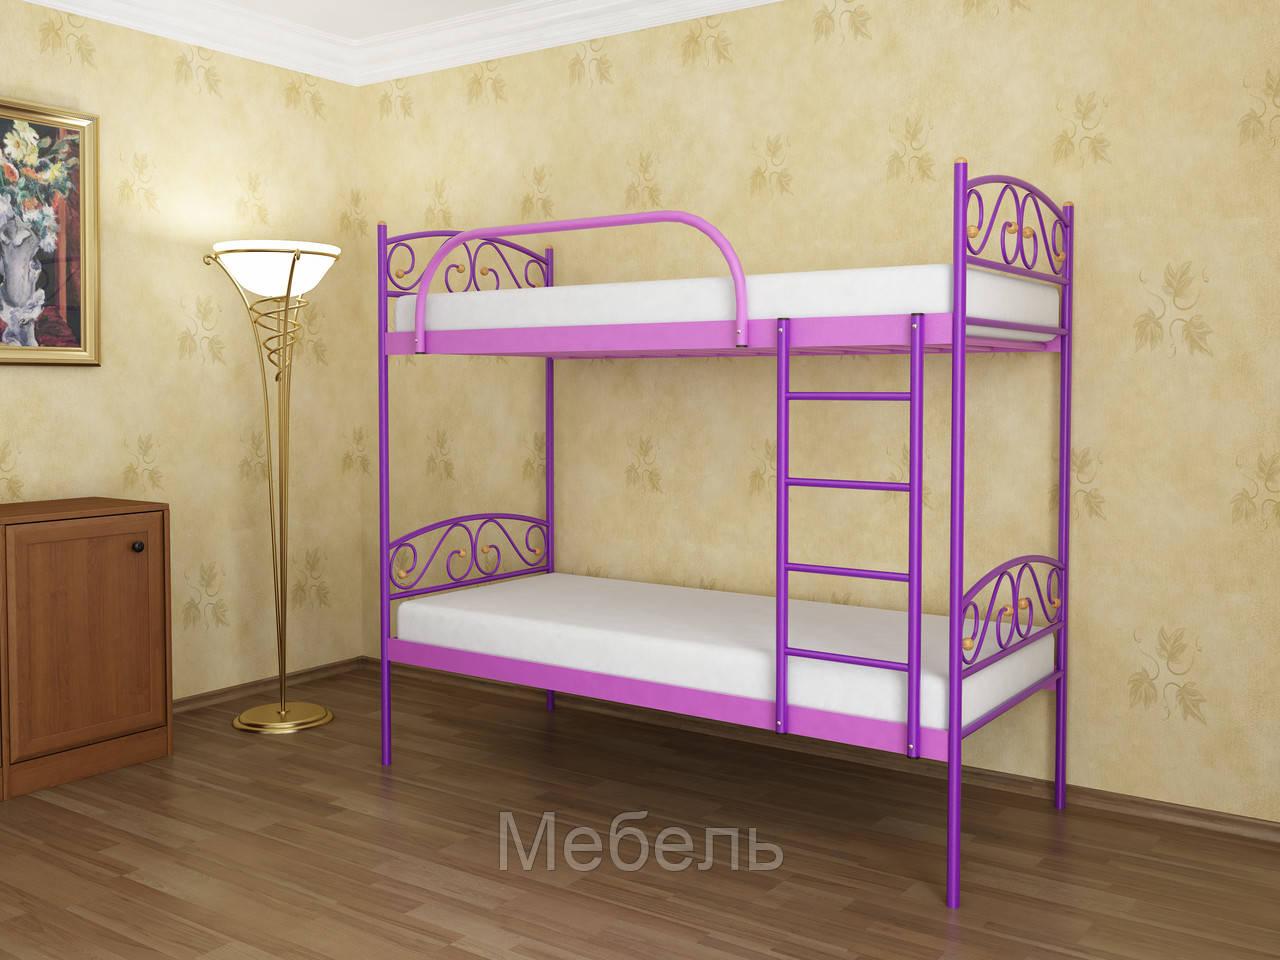 Двухъярусная кровать Верона Дуо Метакам 90*190(200)